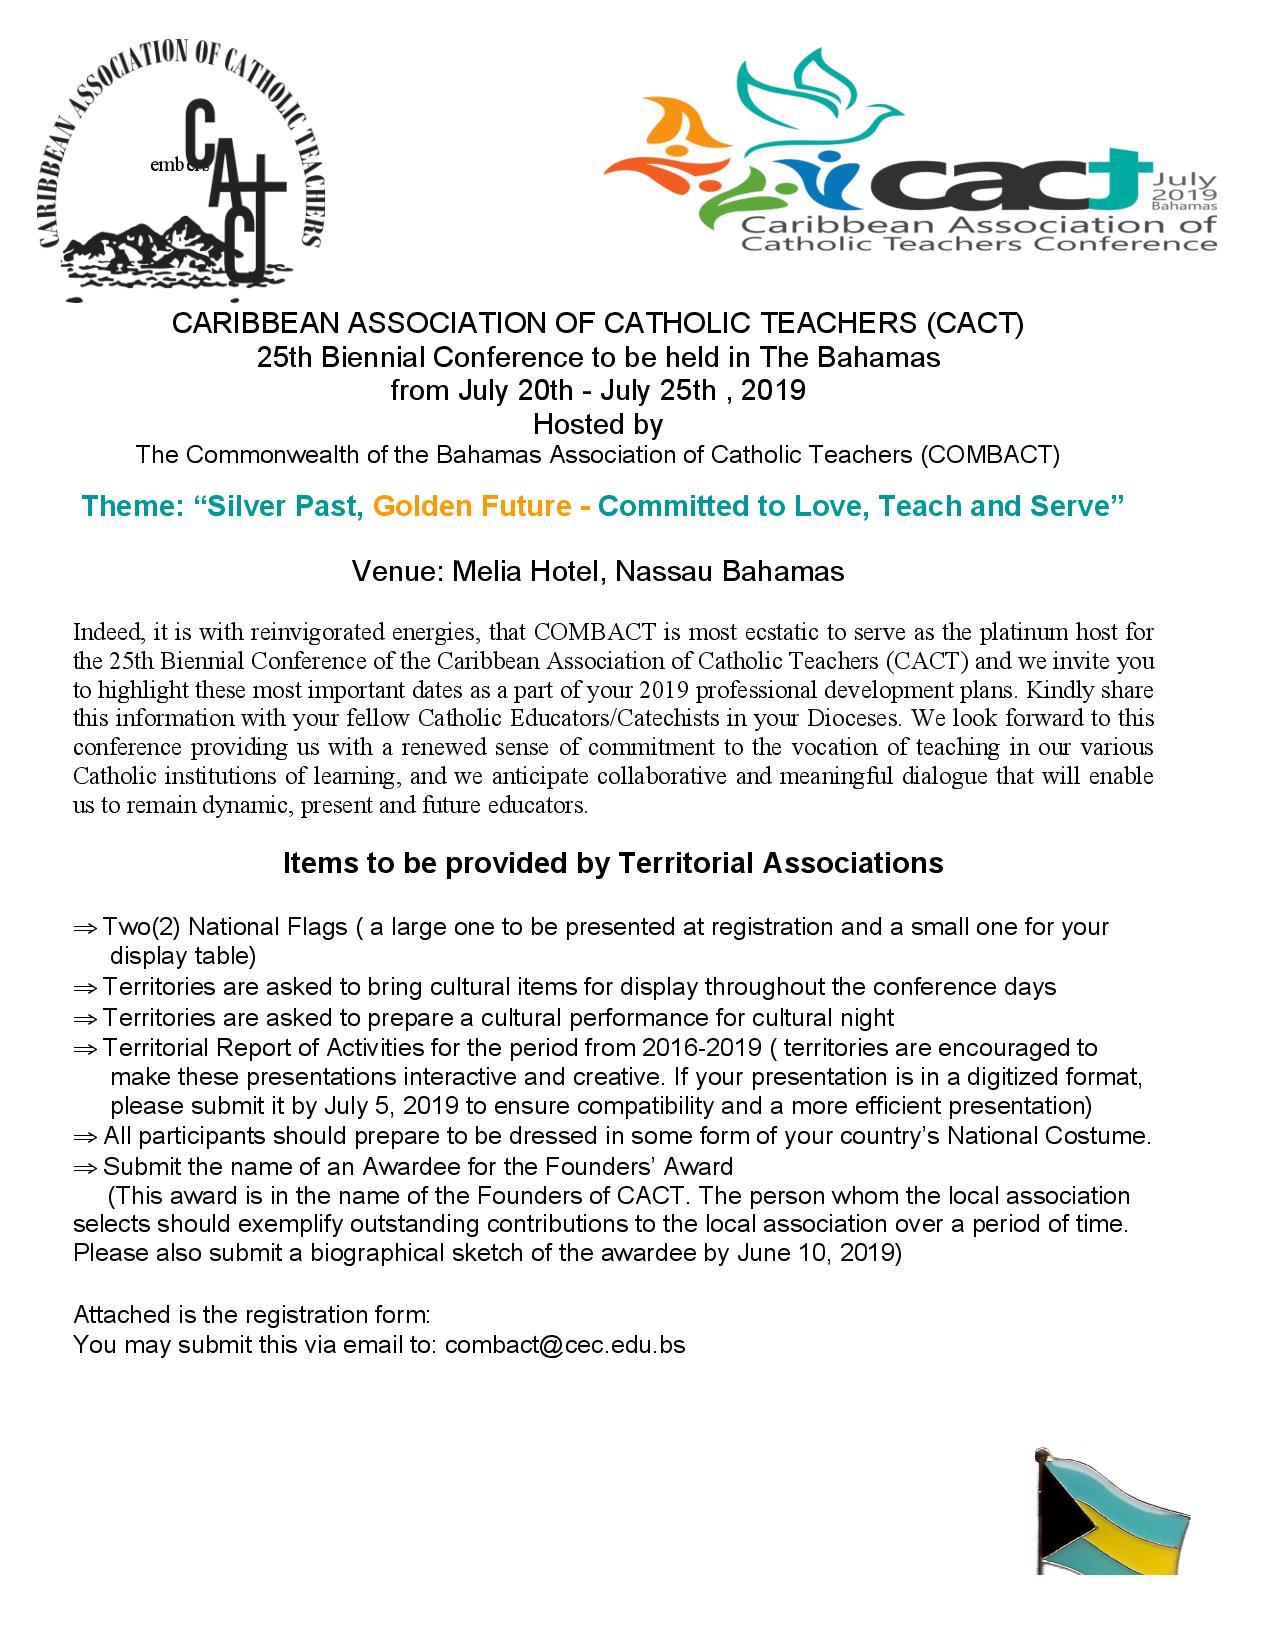 Caribbean Association of Catholic Teachers – 25th Biennial